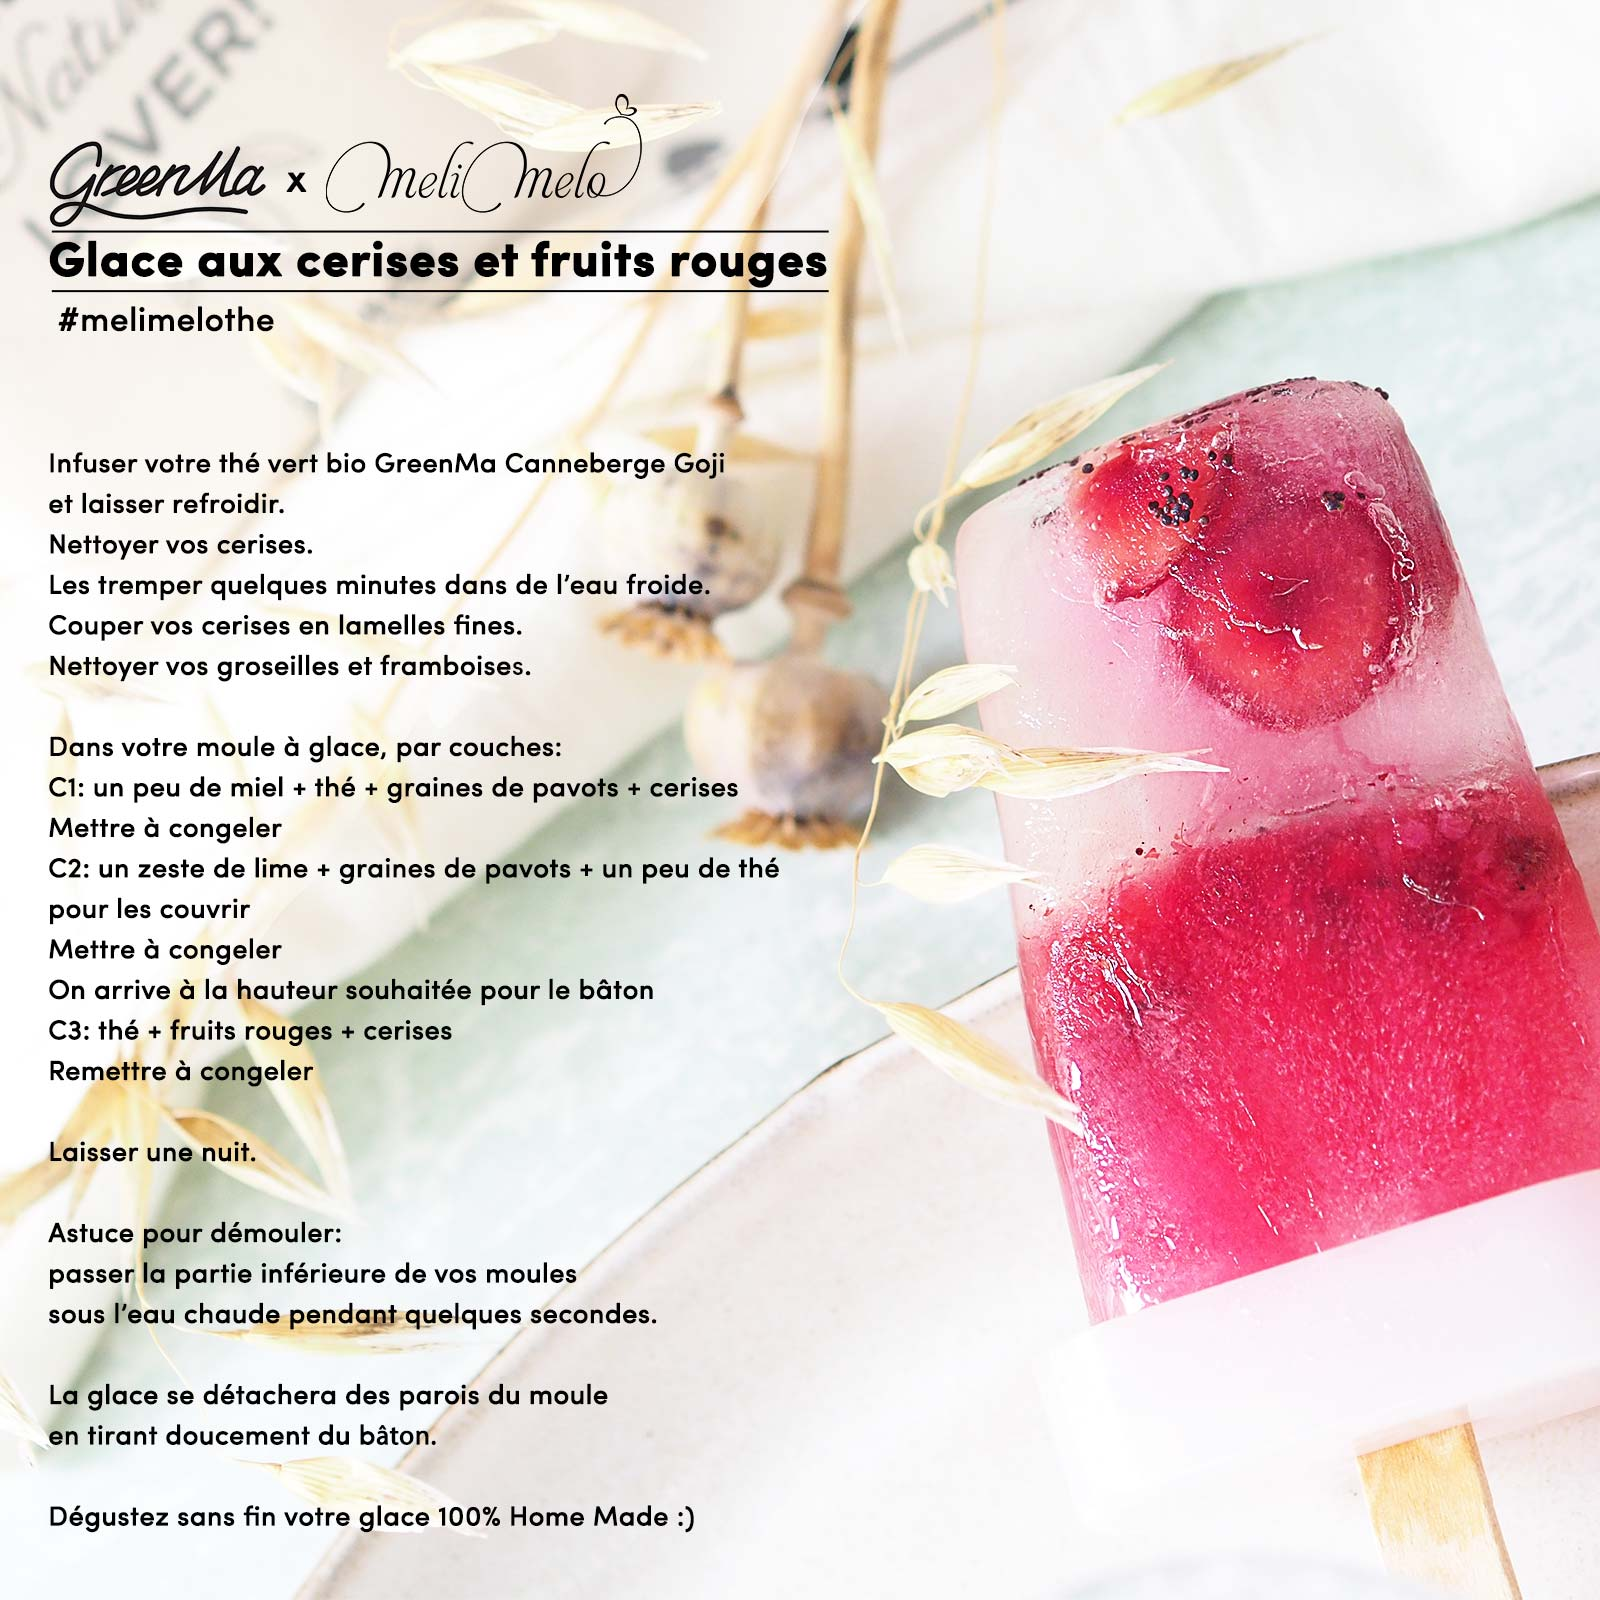 recette-glace-cerises-fruits-rouges-the-vert-bio-canneberge-goji-greenma-france-laboutiquedemelimelo